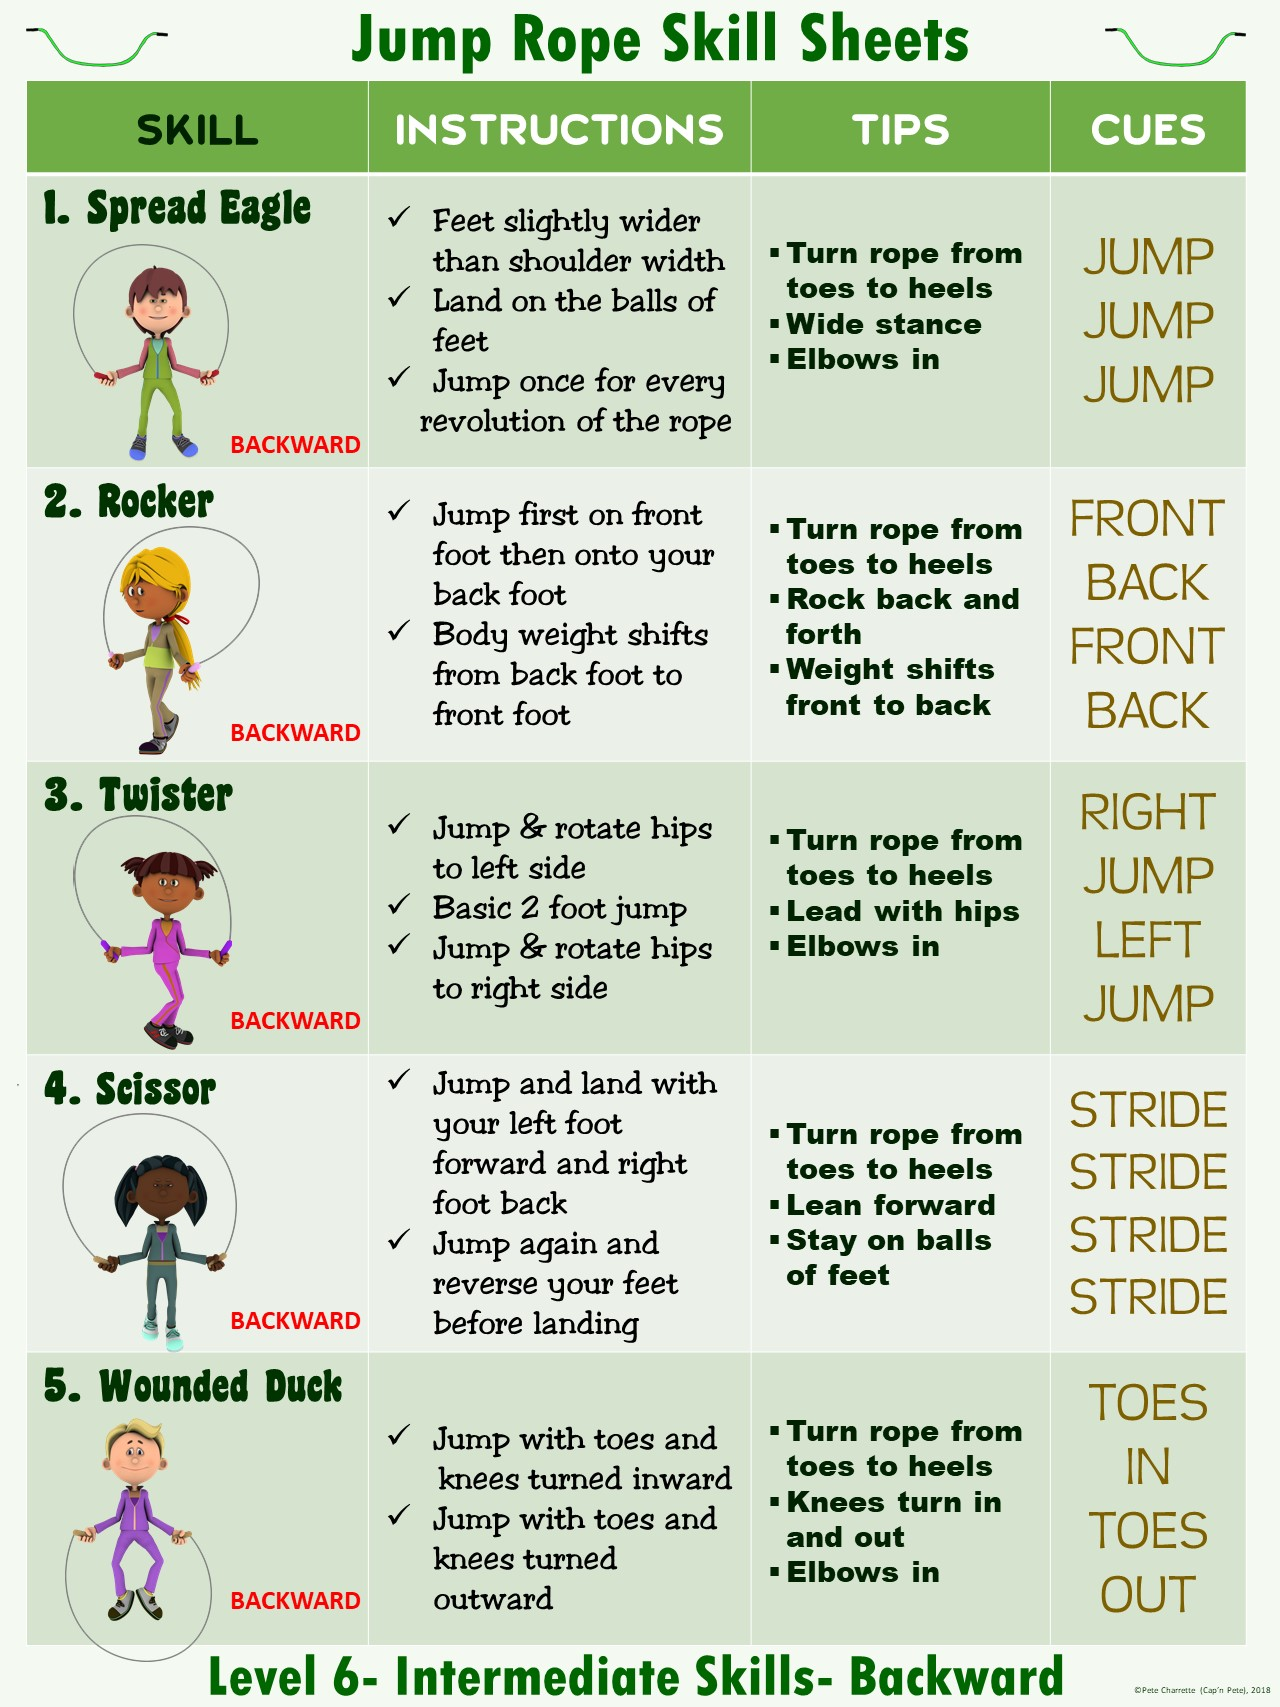 Pe Reciprocal Teaching Series Jump Rope Skill Sheets